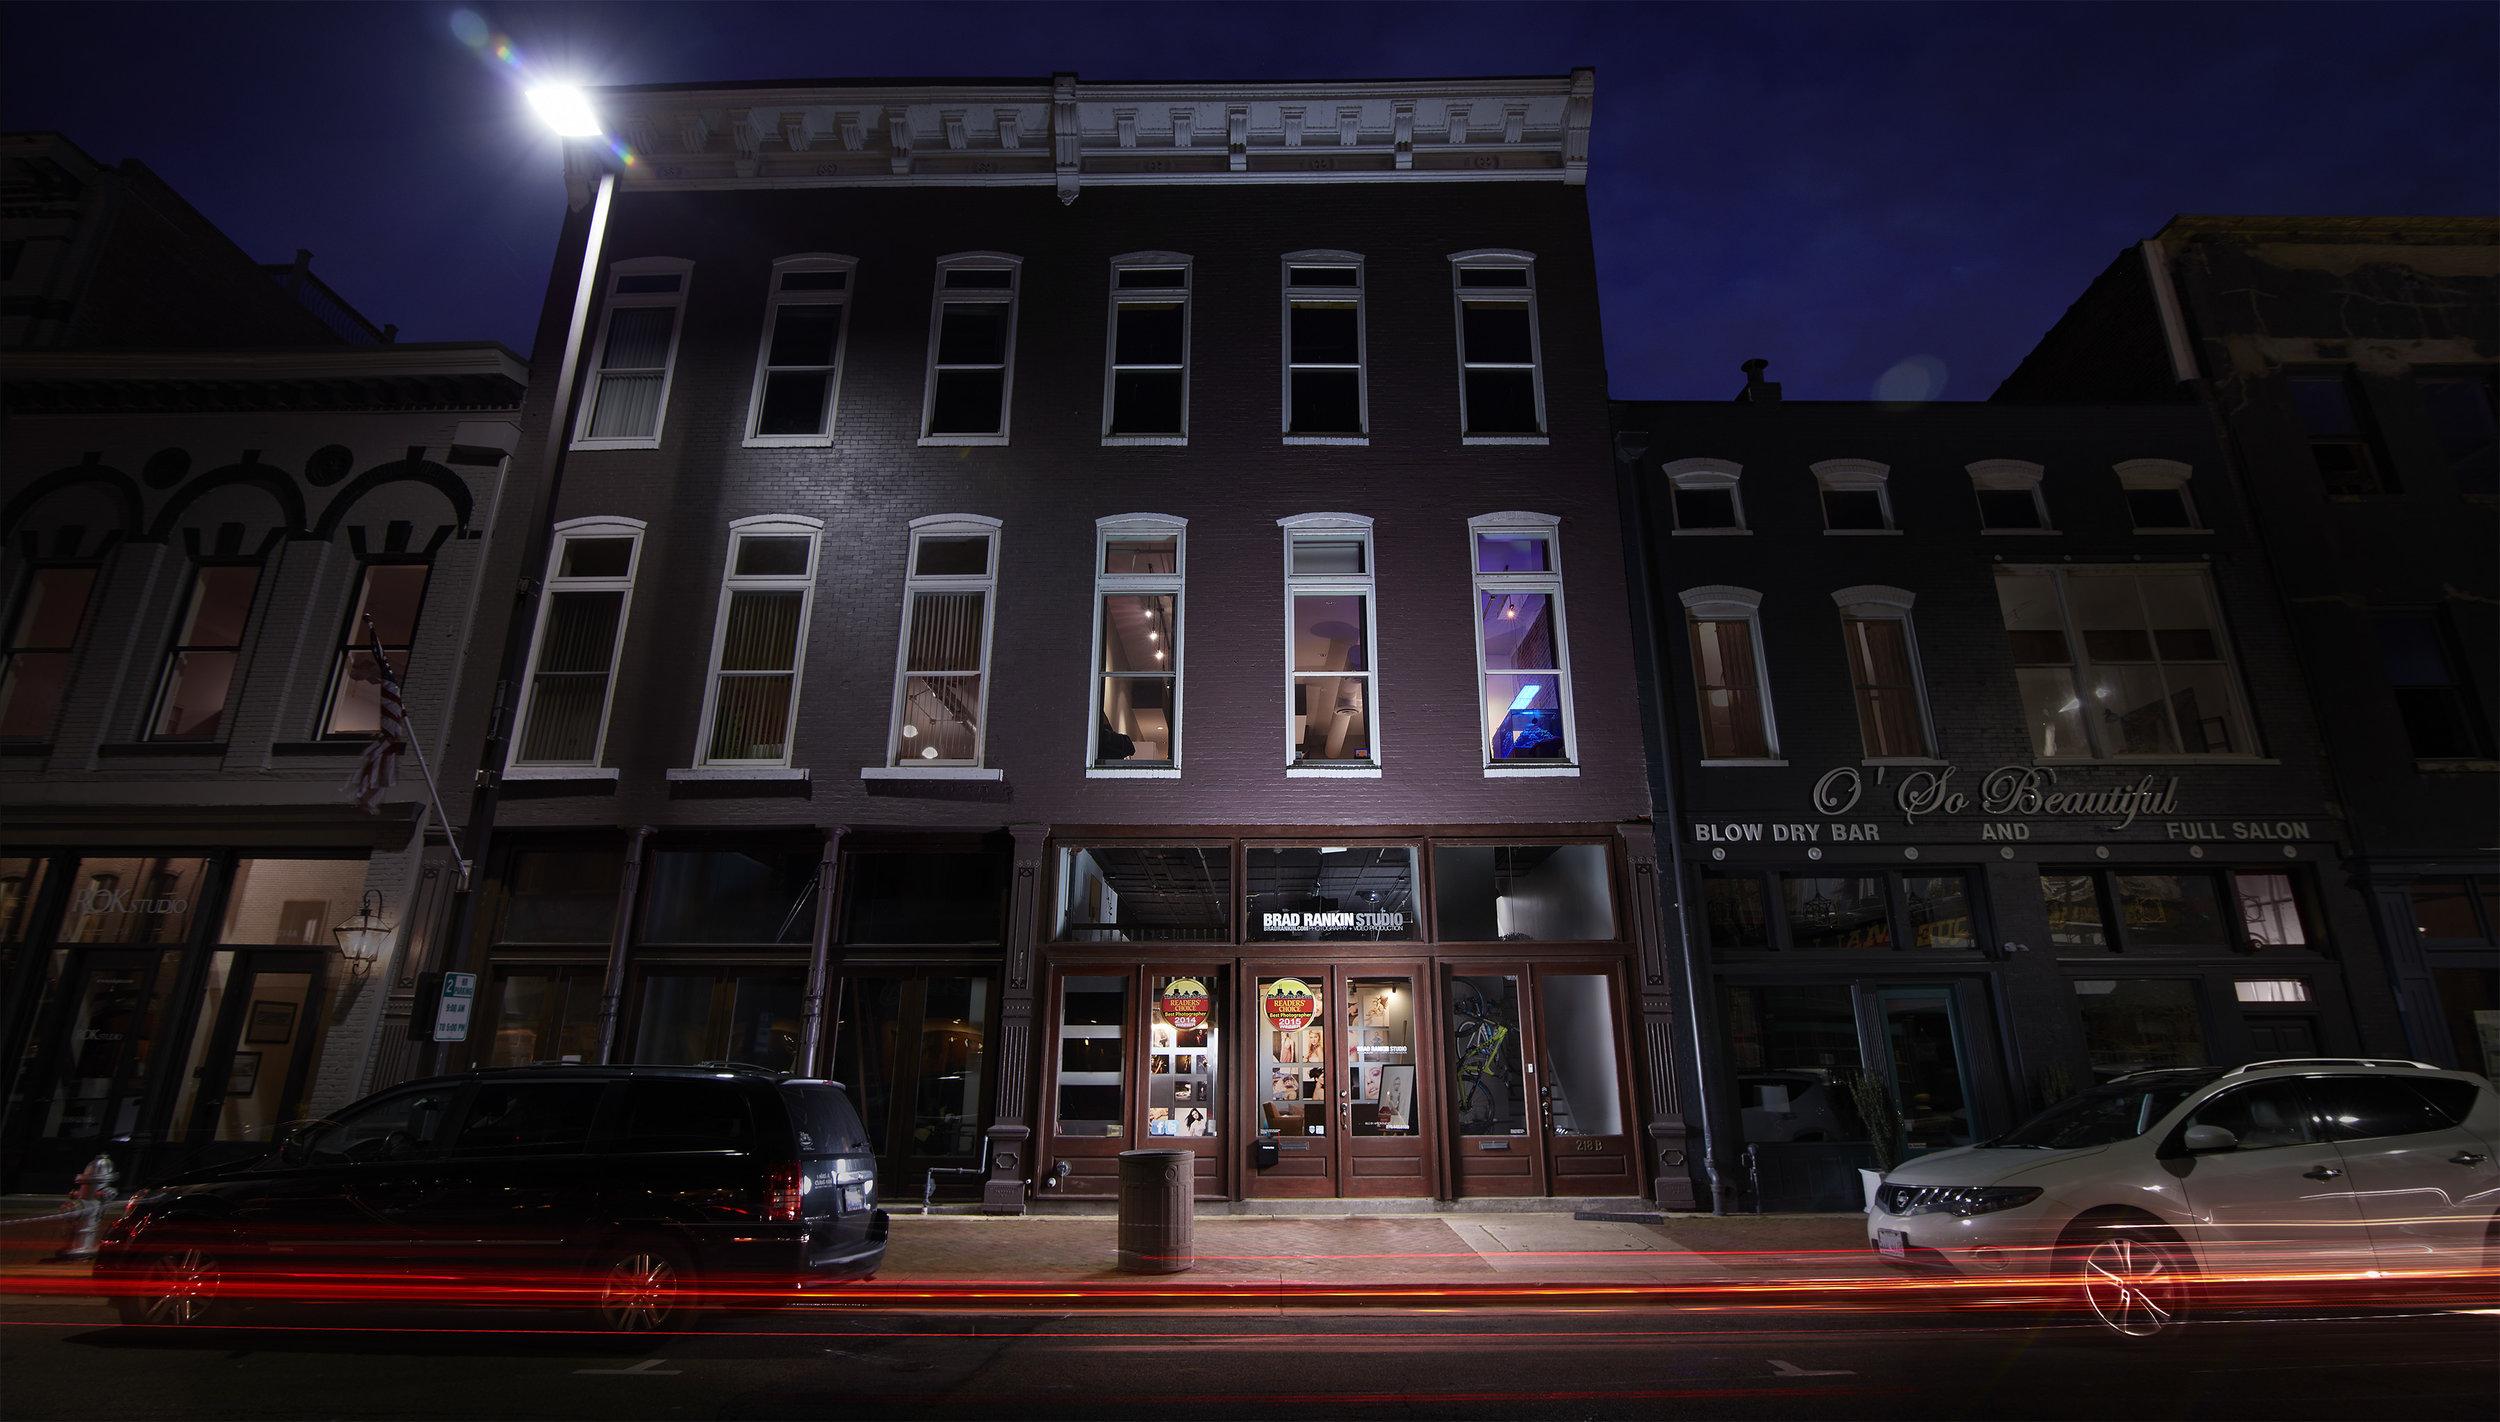 Brad Rankin Studio  - 218 Broadway Street - Paducah, Kentucky 42001 - Storefront.jpg